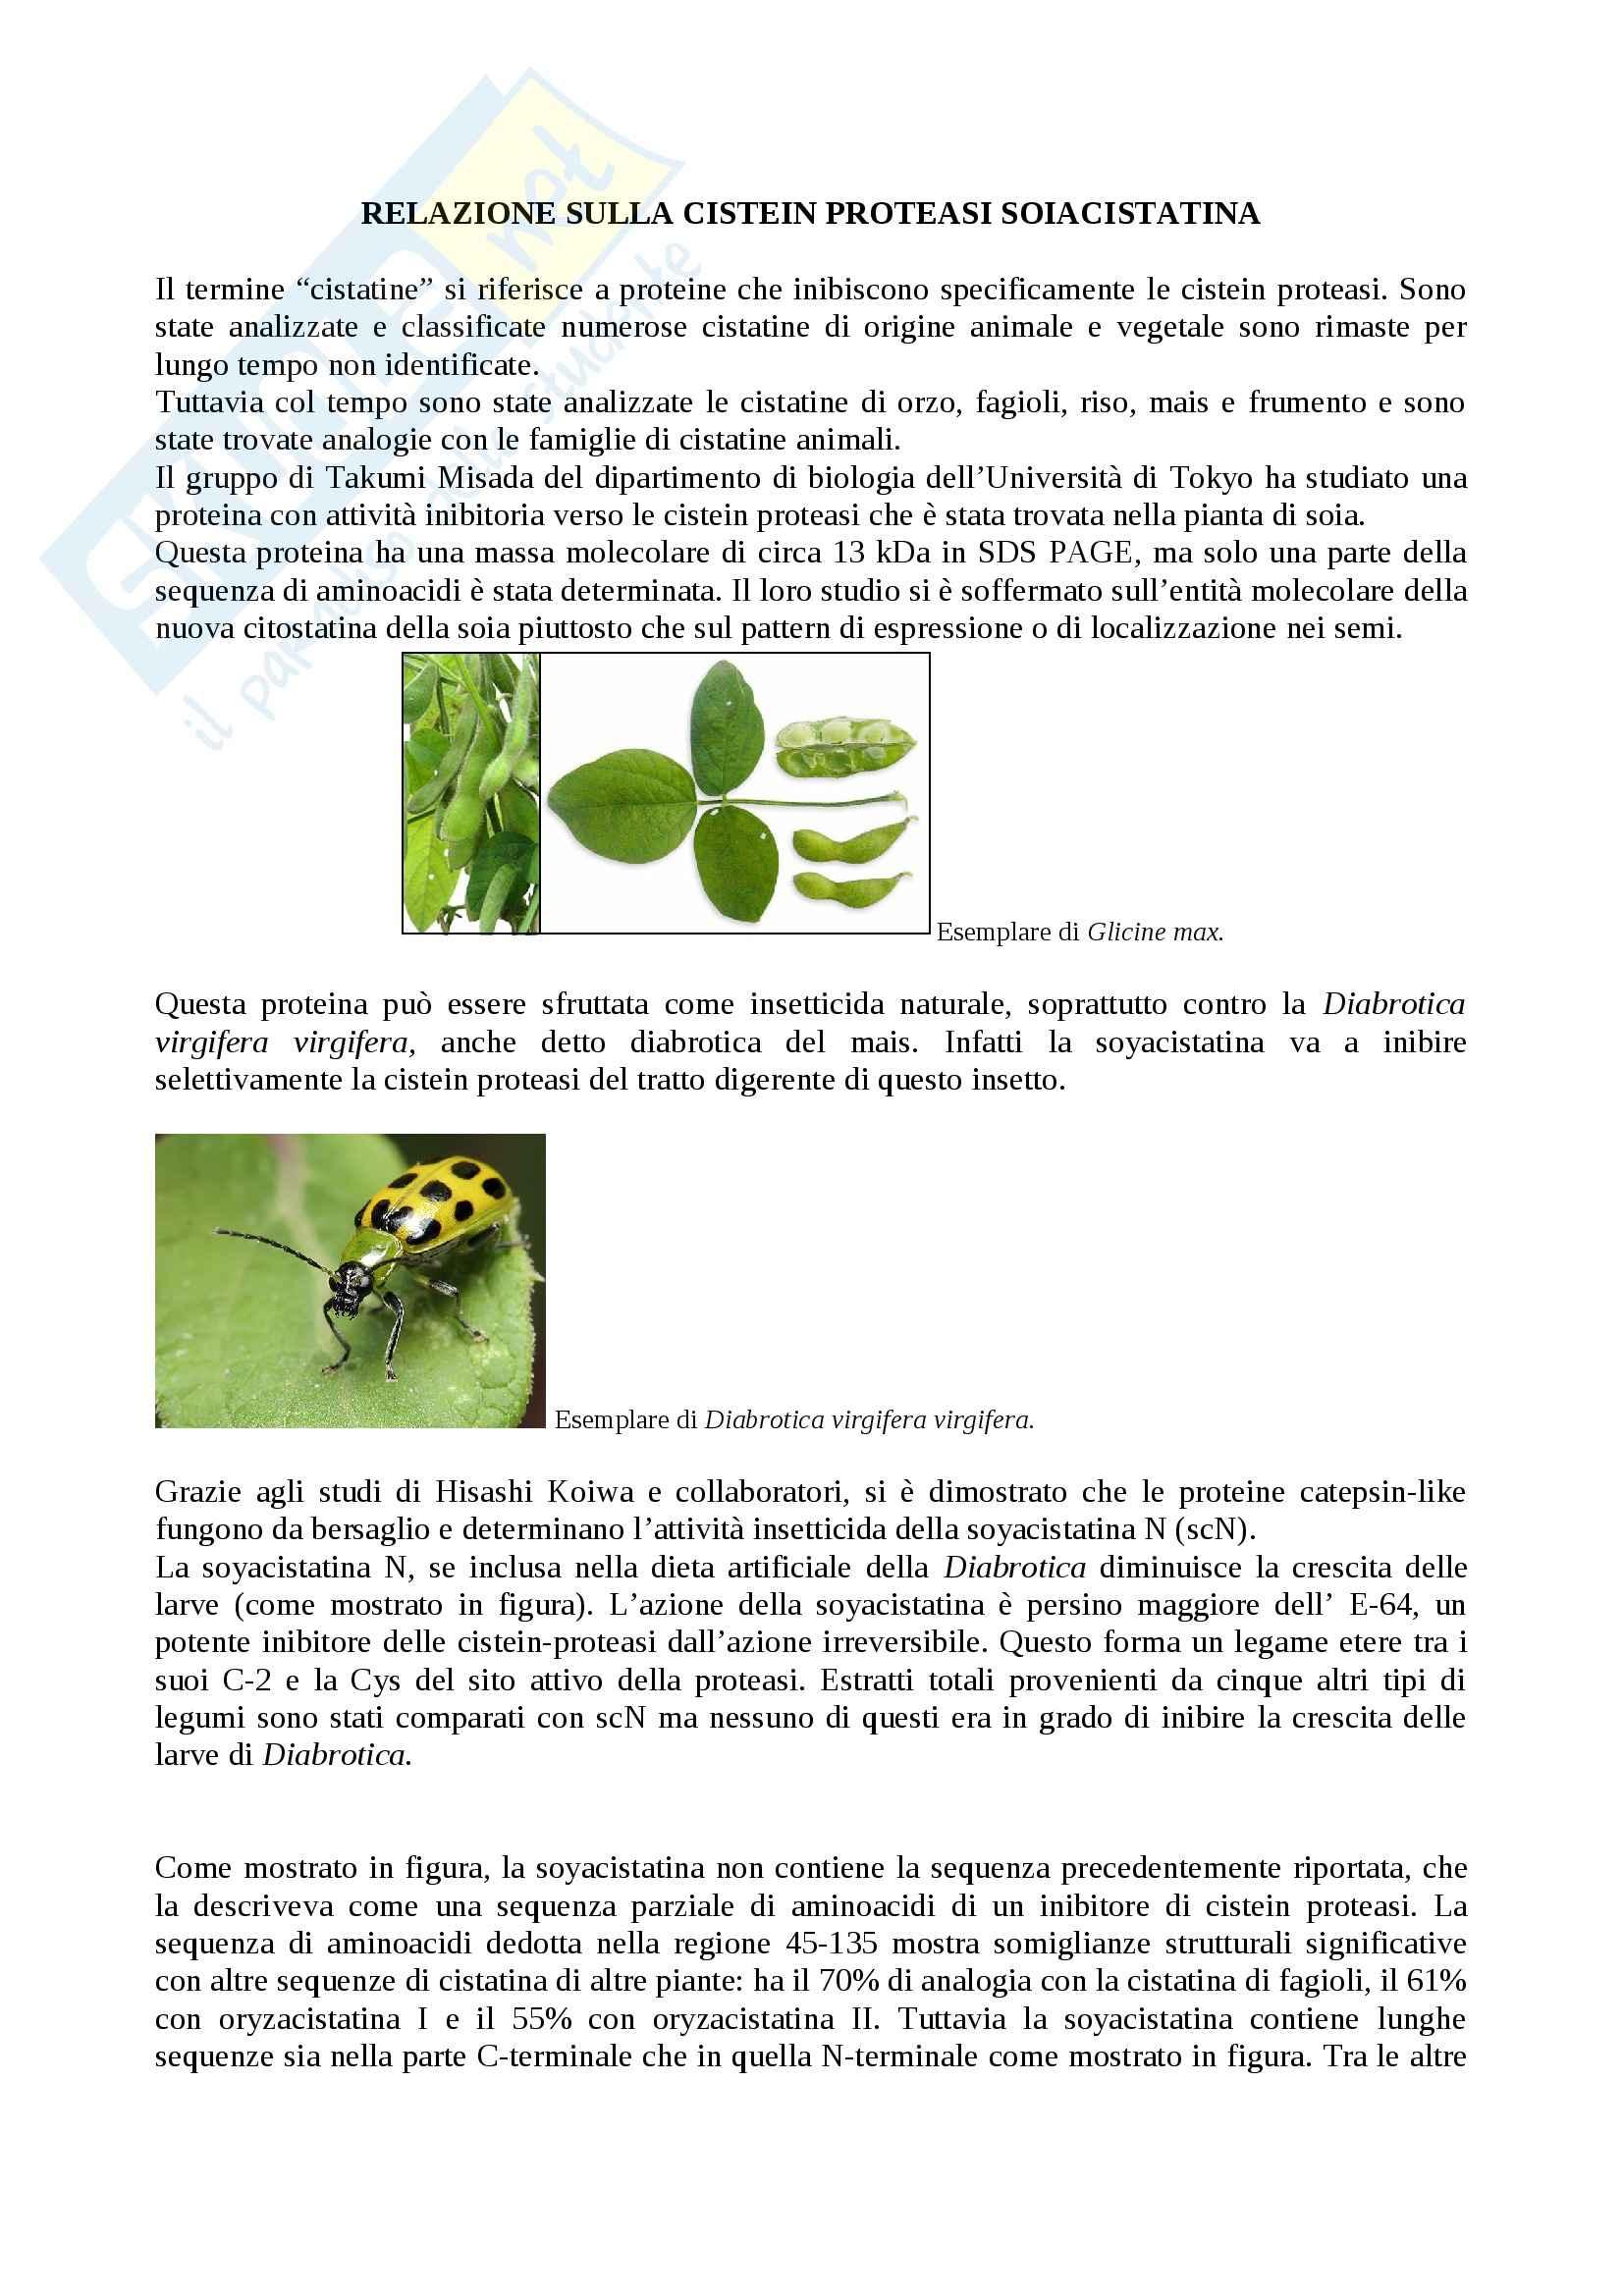 Cistein Proteasi soiacistatina, Proteine nuove Pag. 1